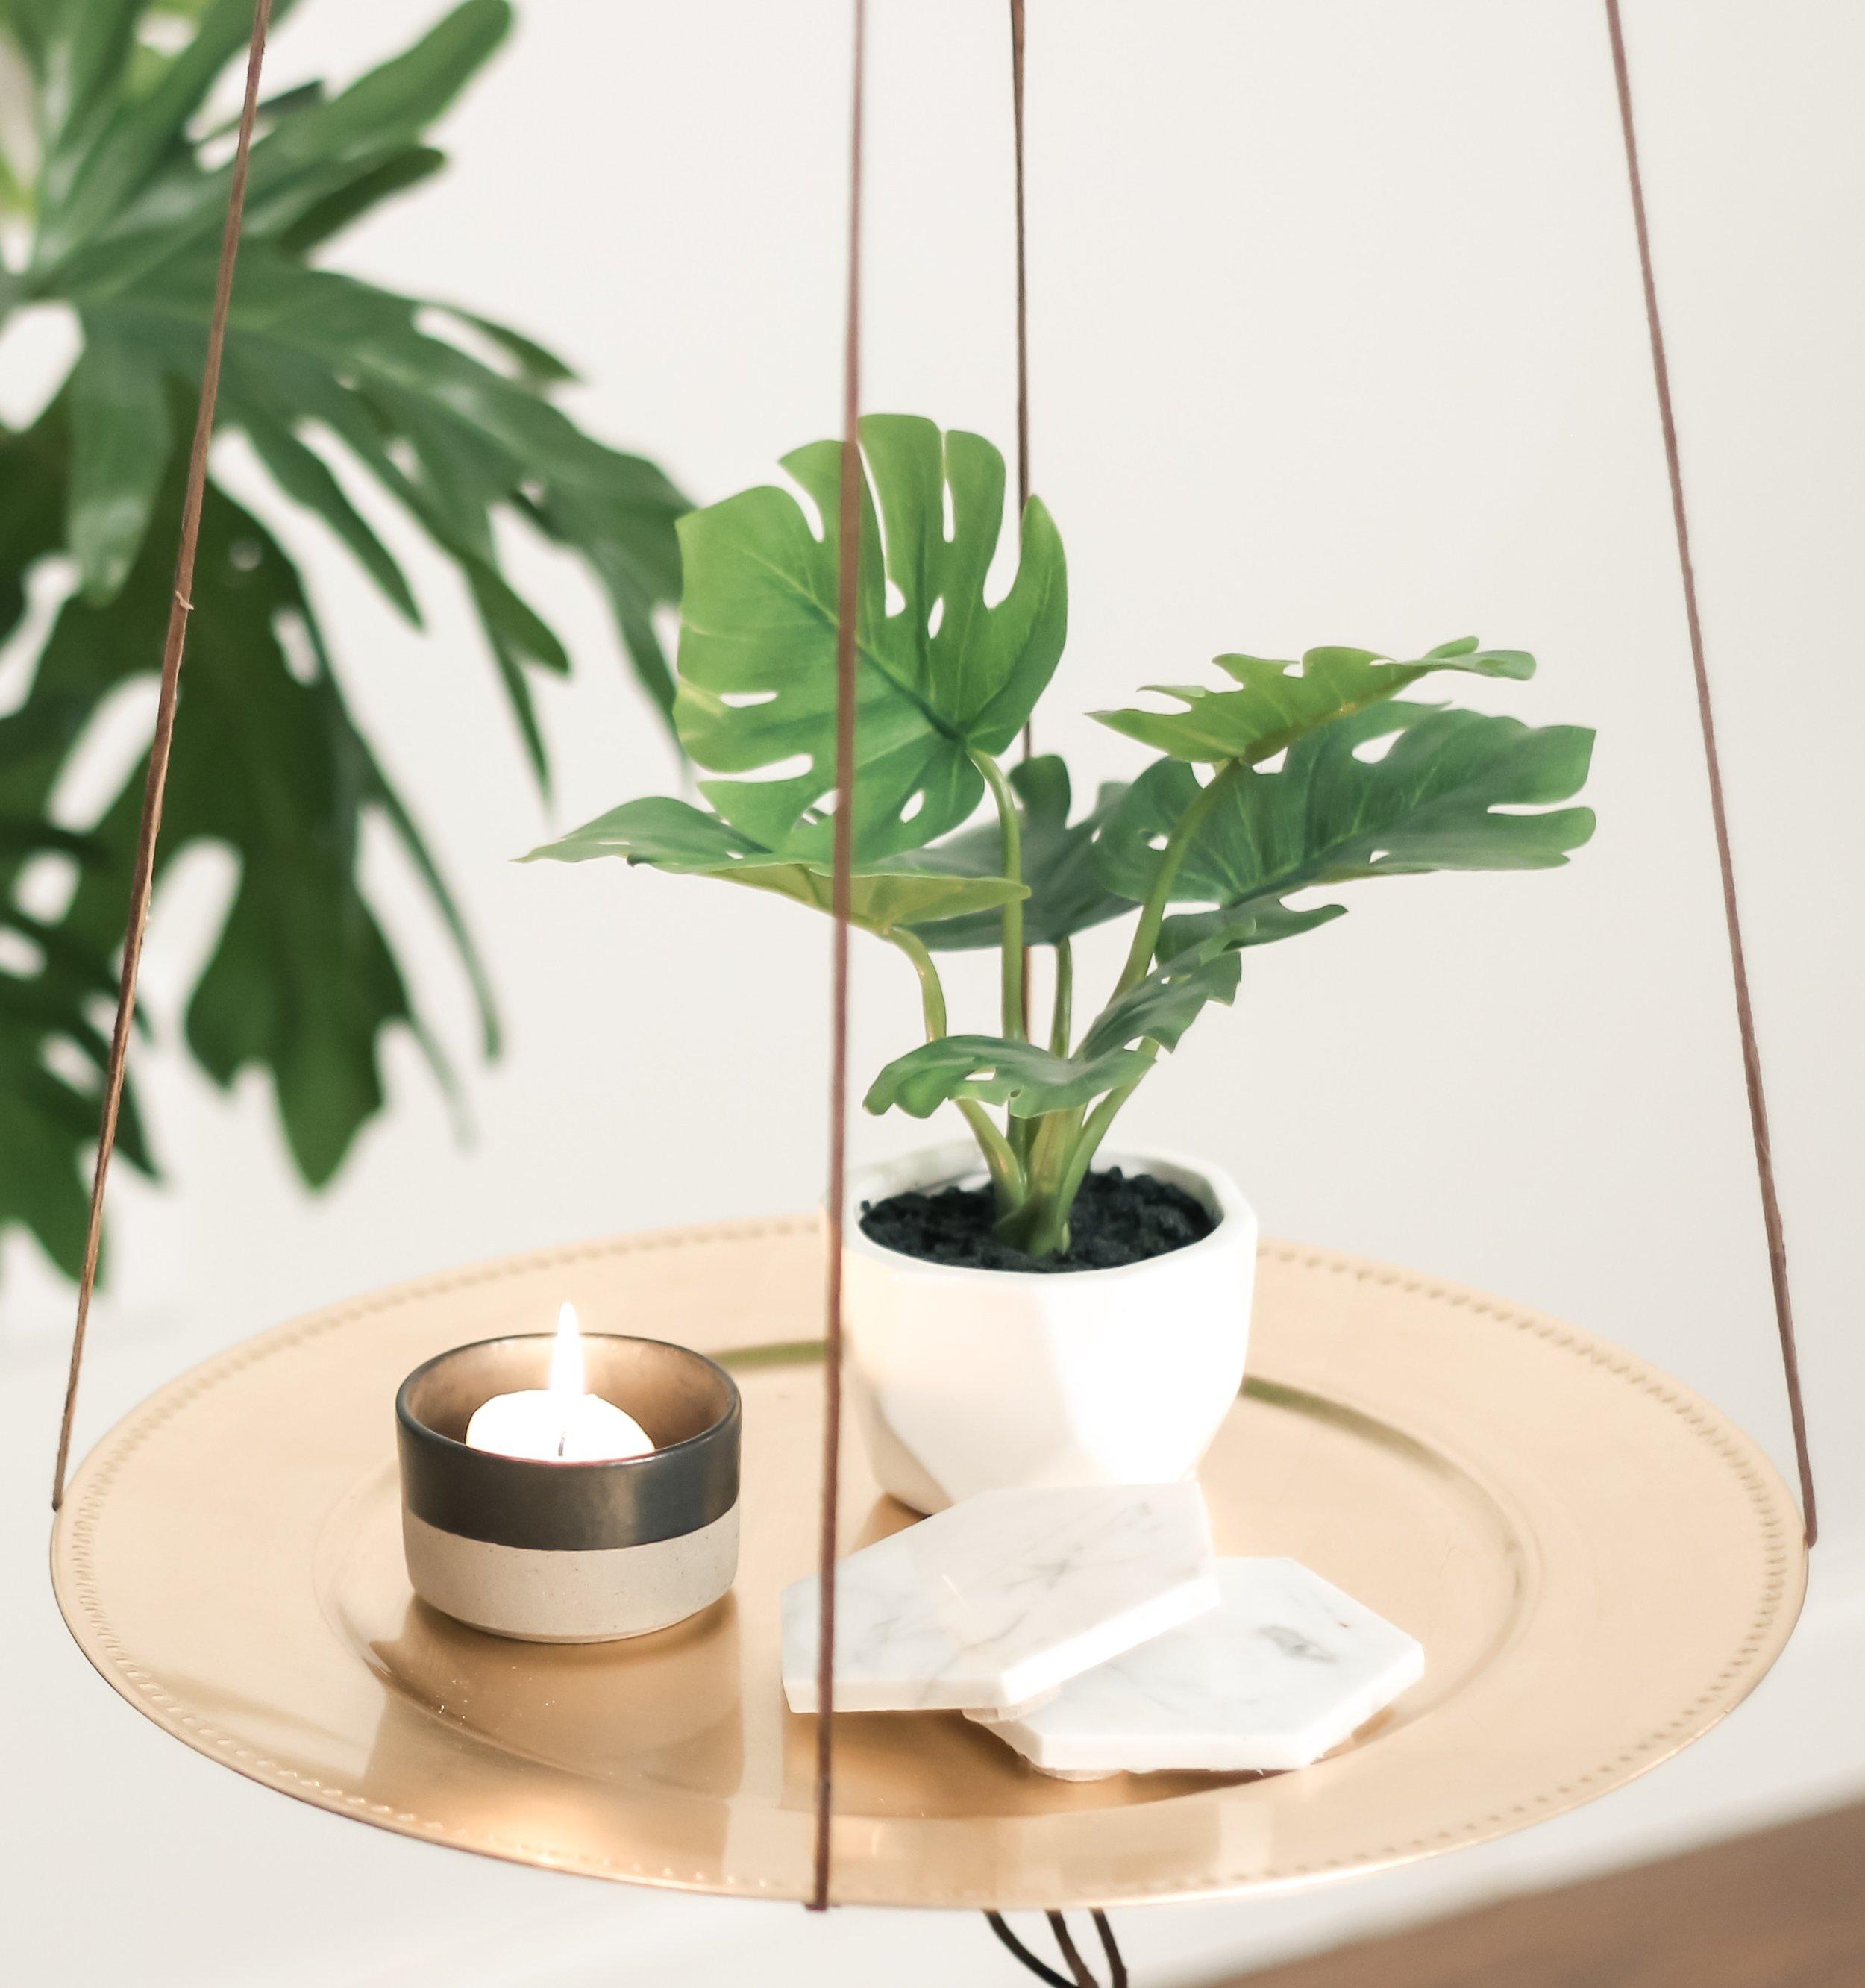 DIY Hanging Side Table